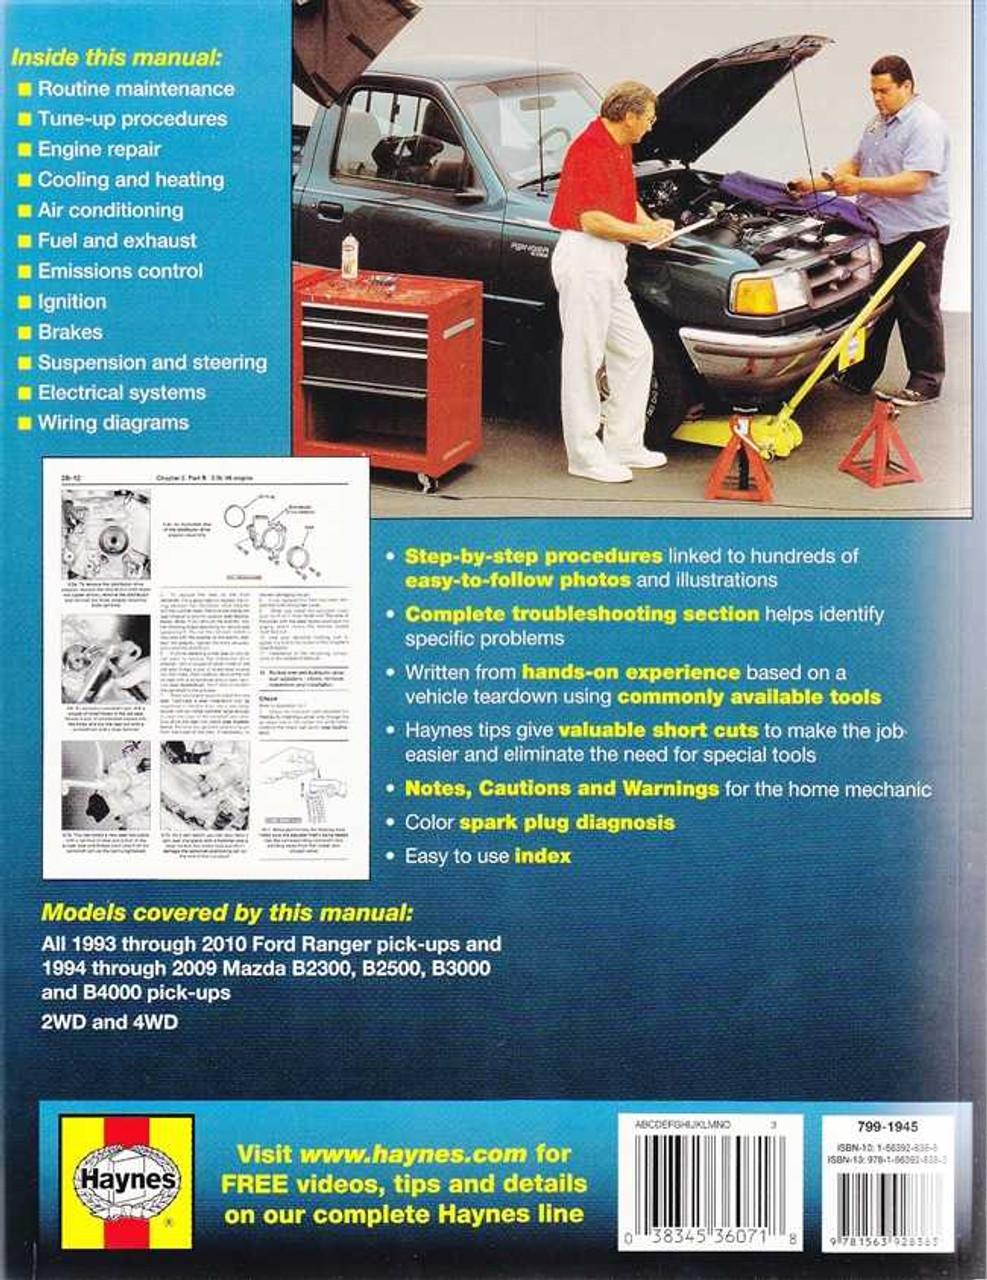 Ford Ranger, Mazda B2300, B2500, B3000, B4000 1993 - 2010 Workshop ...